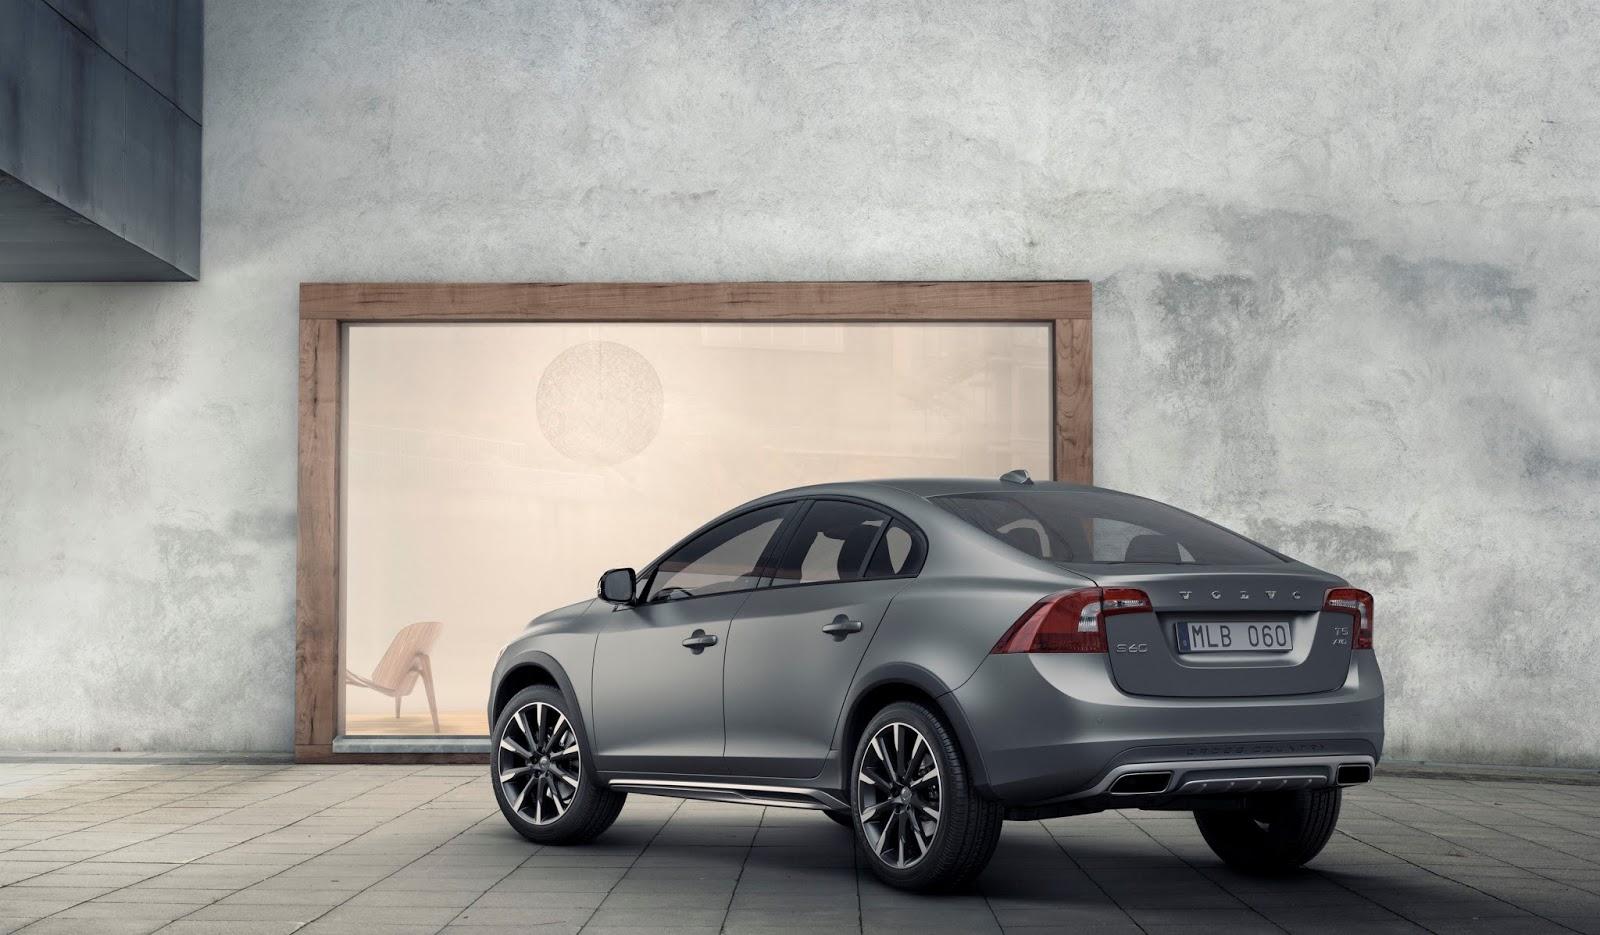 VOLVO%2BS60%2BCROSS%2BCOUNTRY%2B3 Η Volvo με το νέο S60 Cross Country δημιουργεί το πρώτο sedan με διττό χαρακτήρα